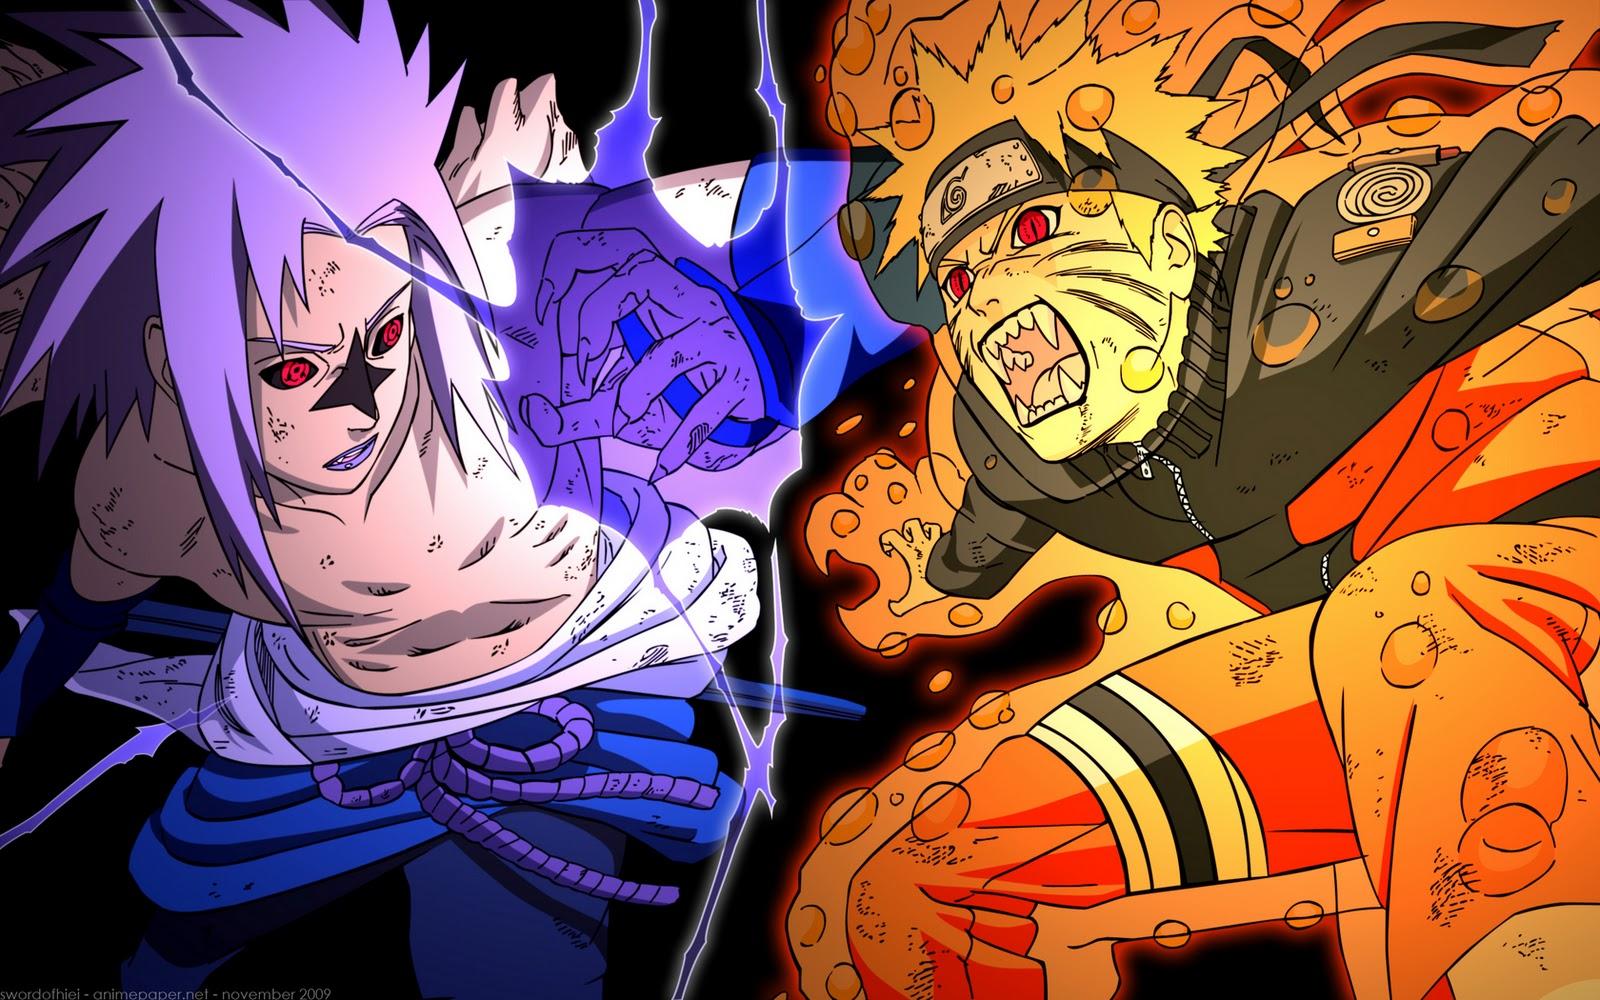 Naruto Shippuden Wallpaper Celular: Wallpaper Naruto Shippuden